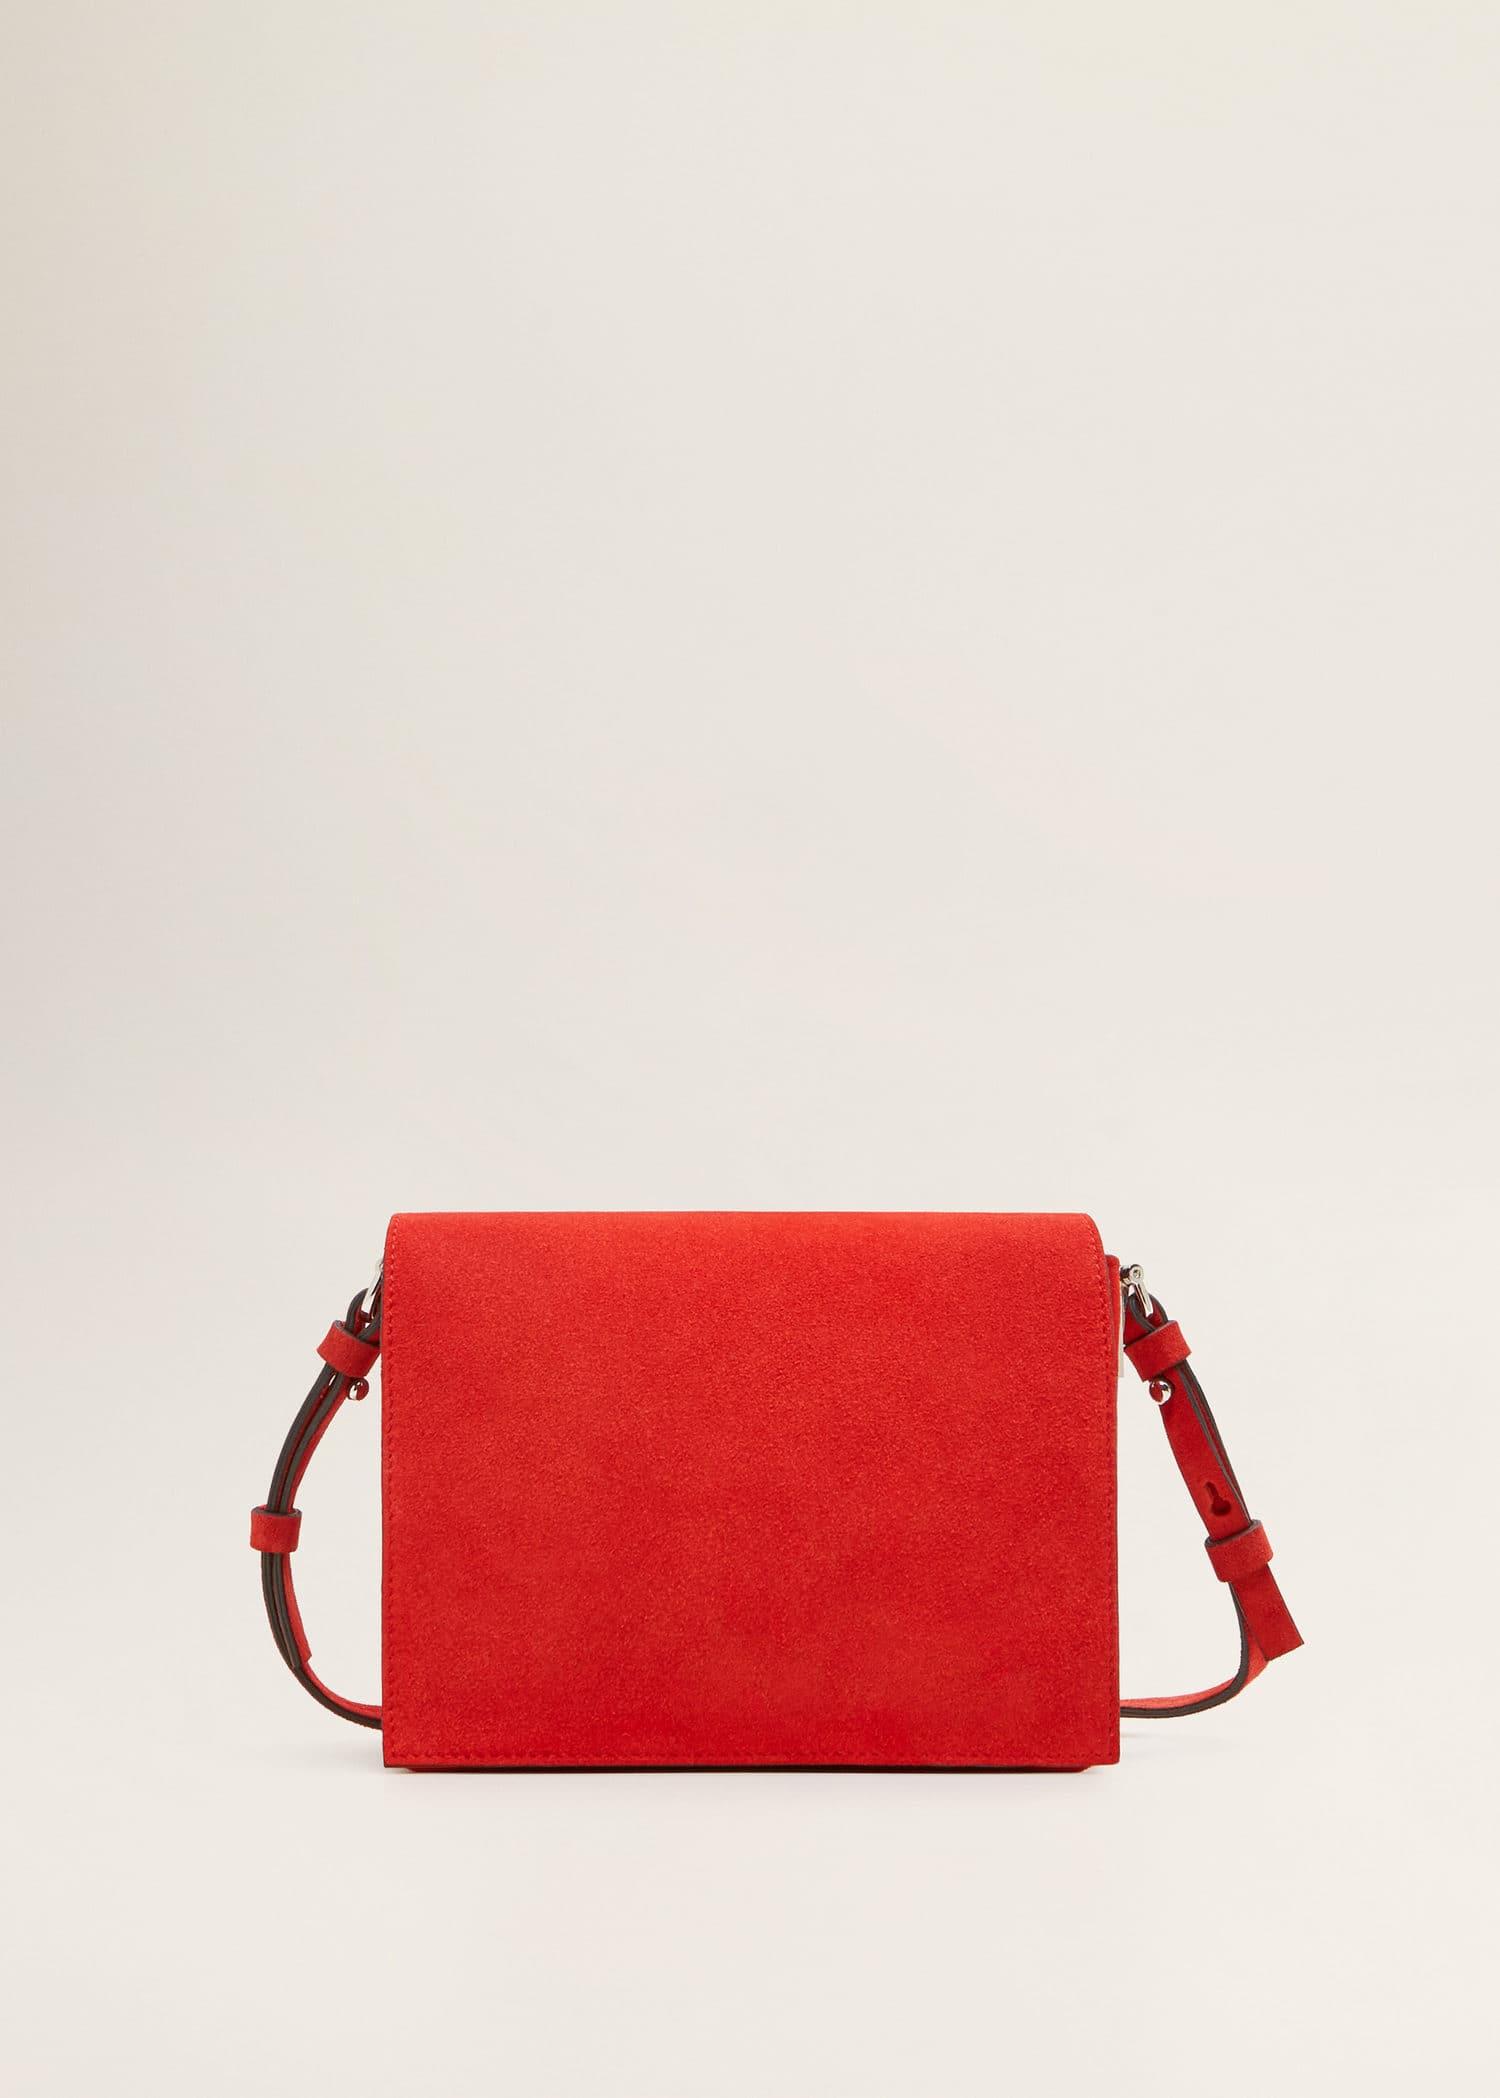 Mini sac cuir Femme | MANGO Maroc